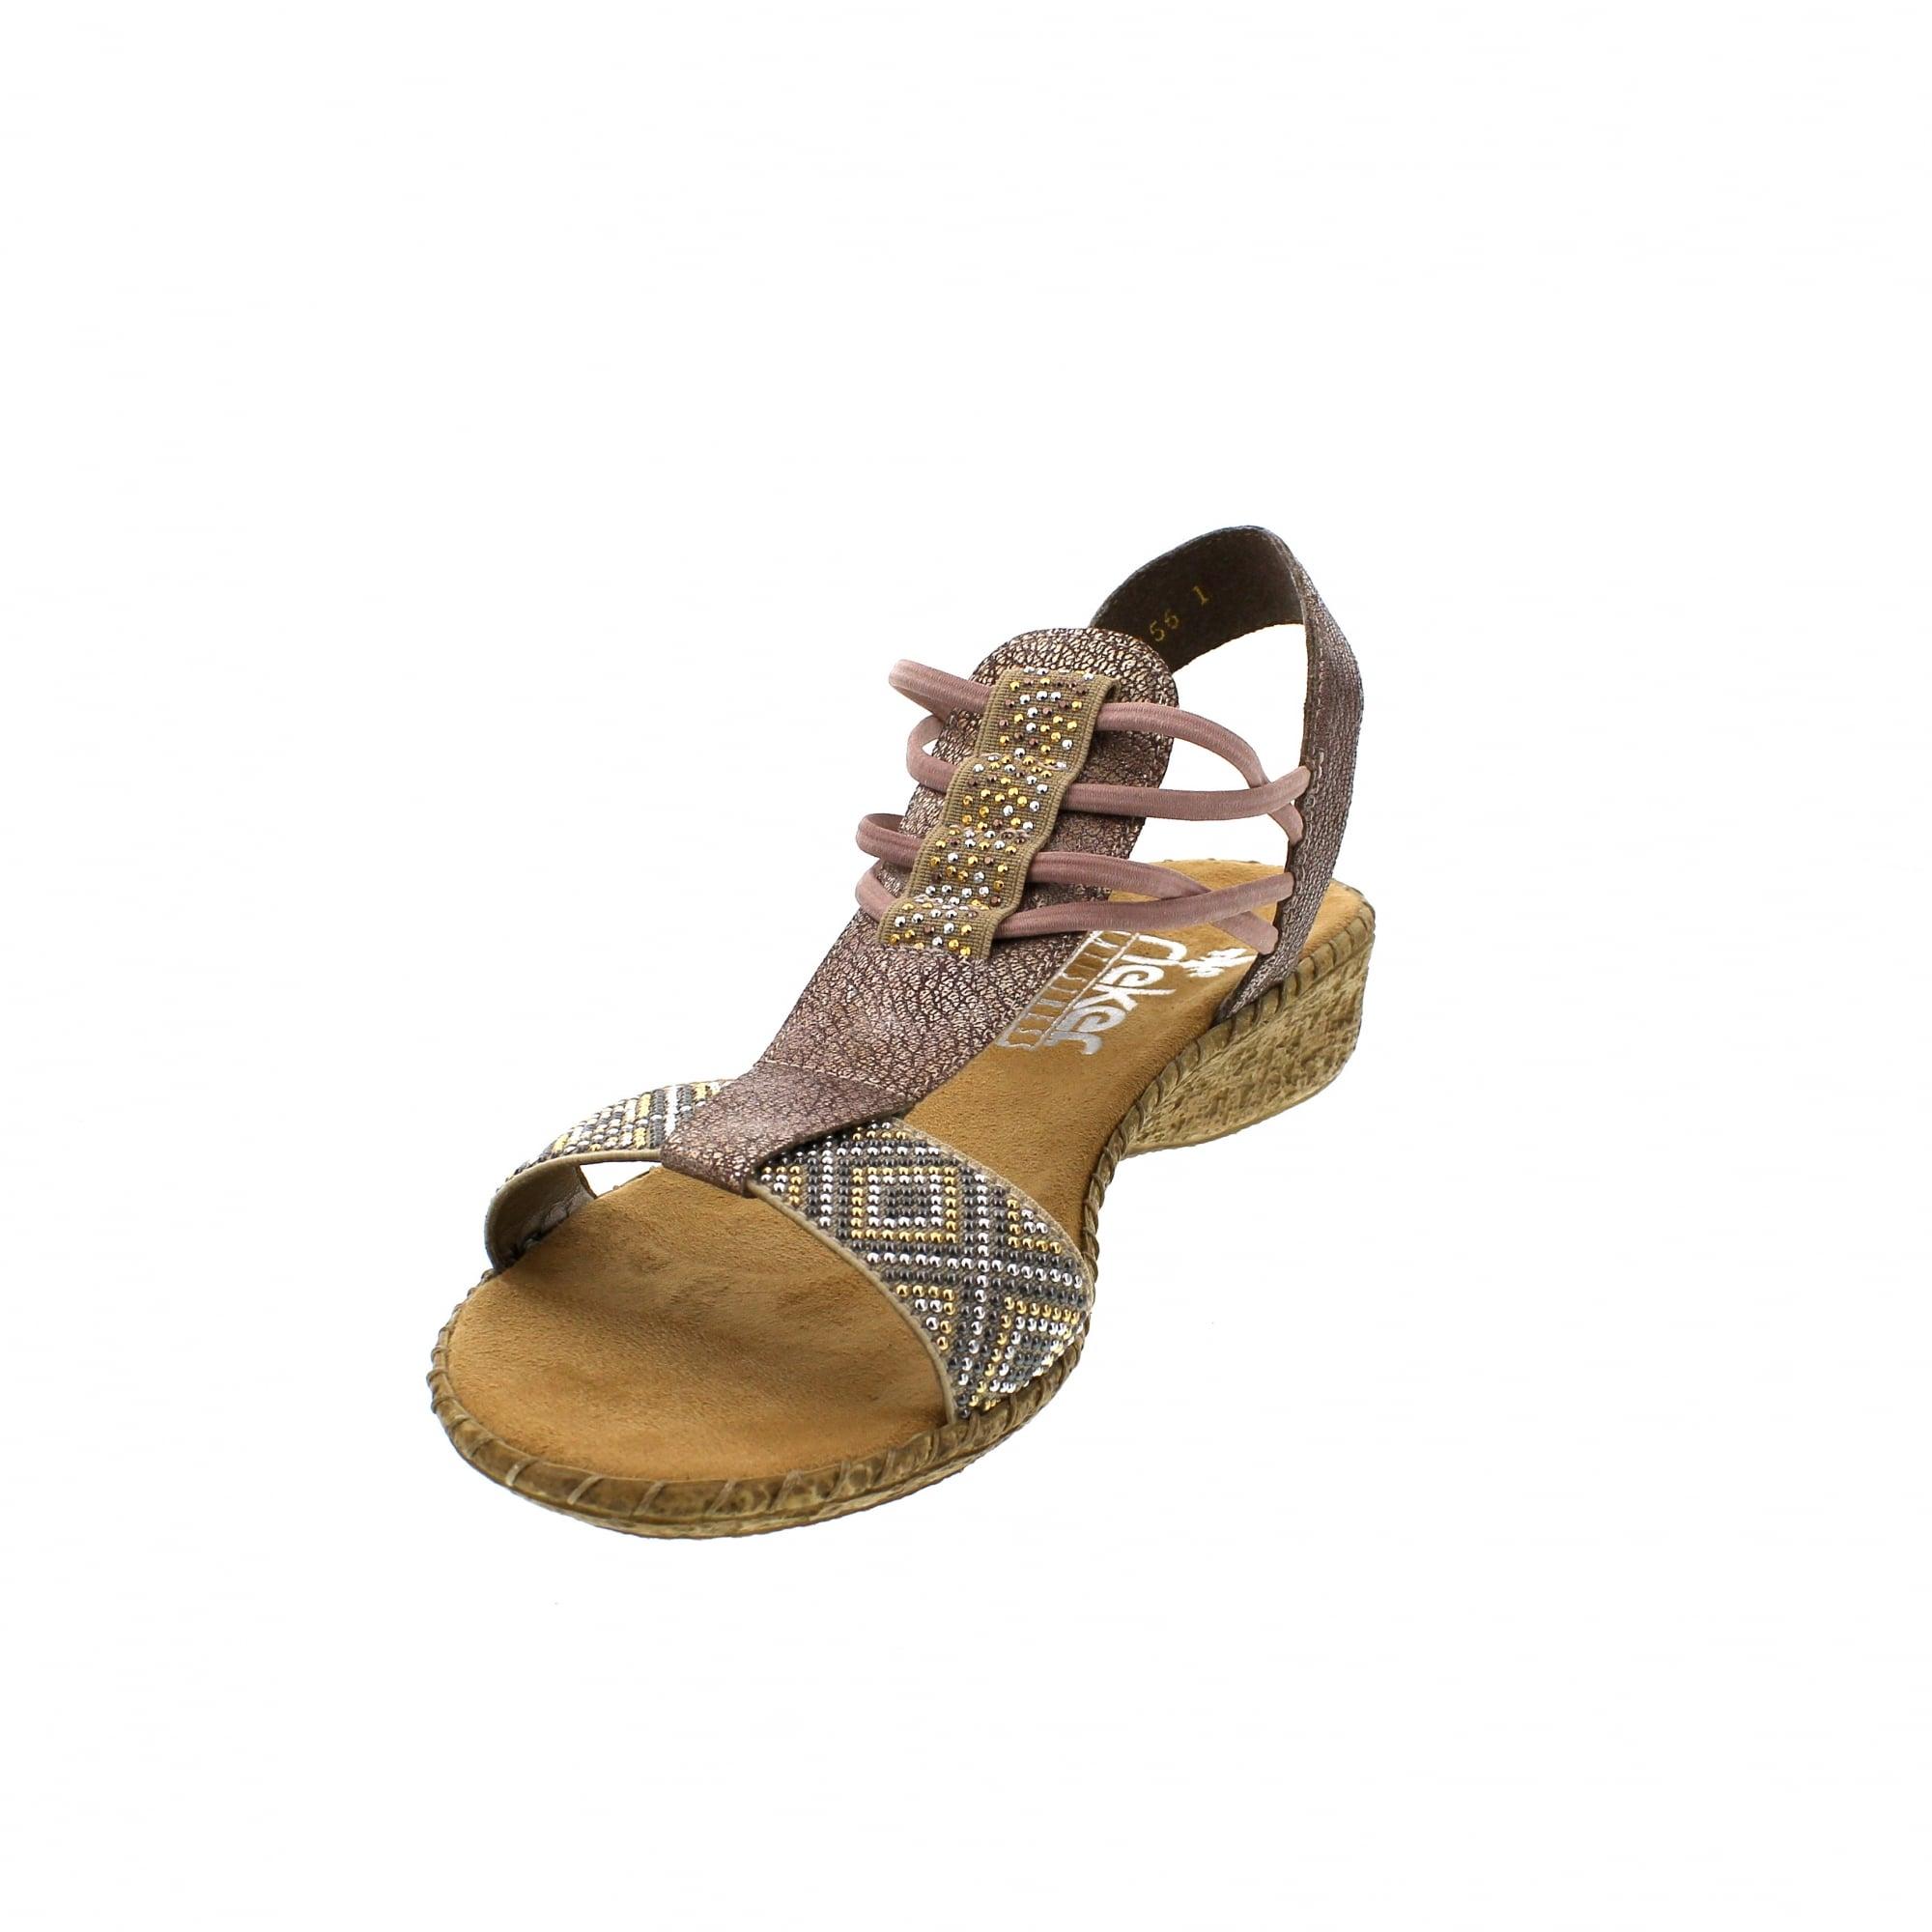 44c85af6cb Rieker 61662-60 Rose Metallic Womens Sandals